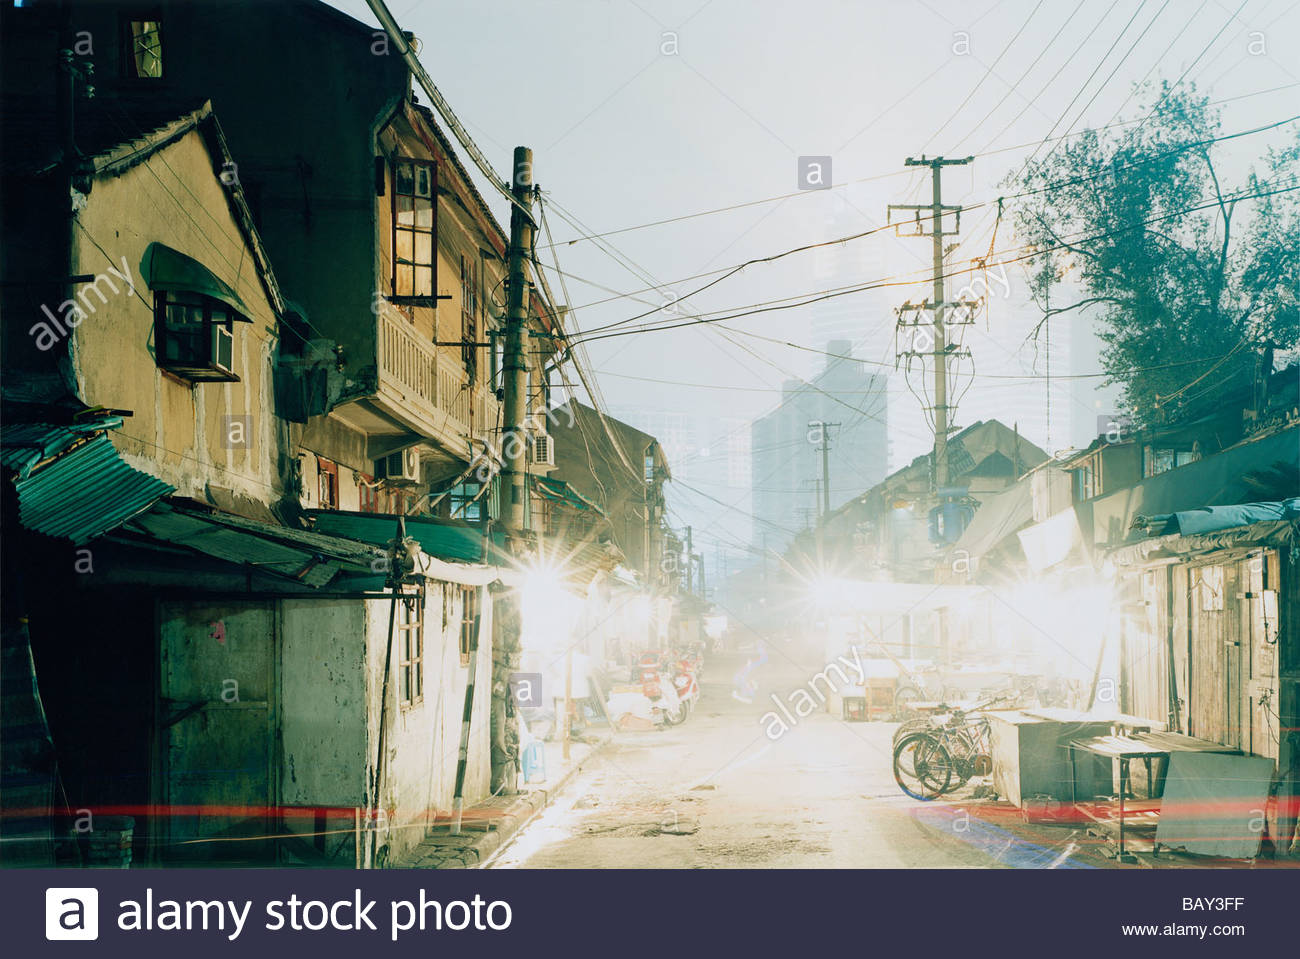 Houses, Longtangs, are being demolished to make way for new buildings, Urban development, Waicangqiao Jie, Shanghai, - Stock Image